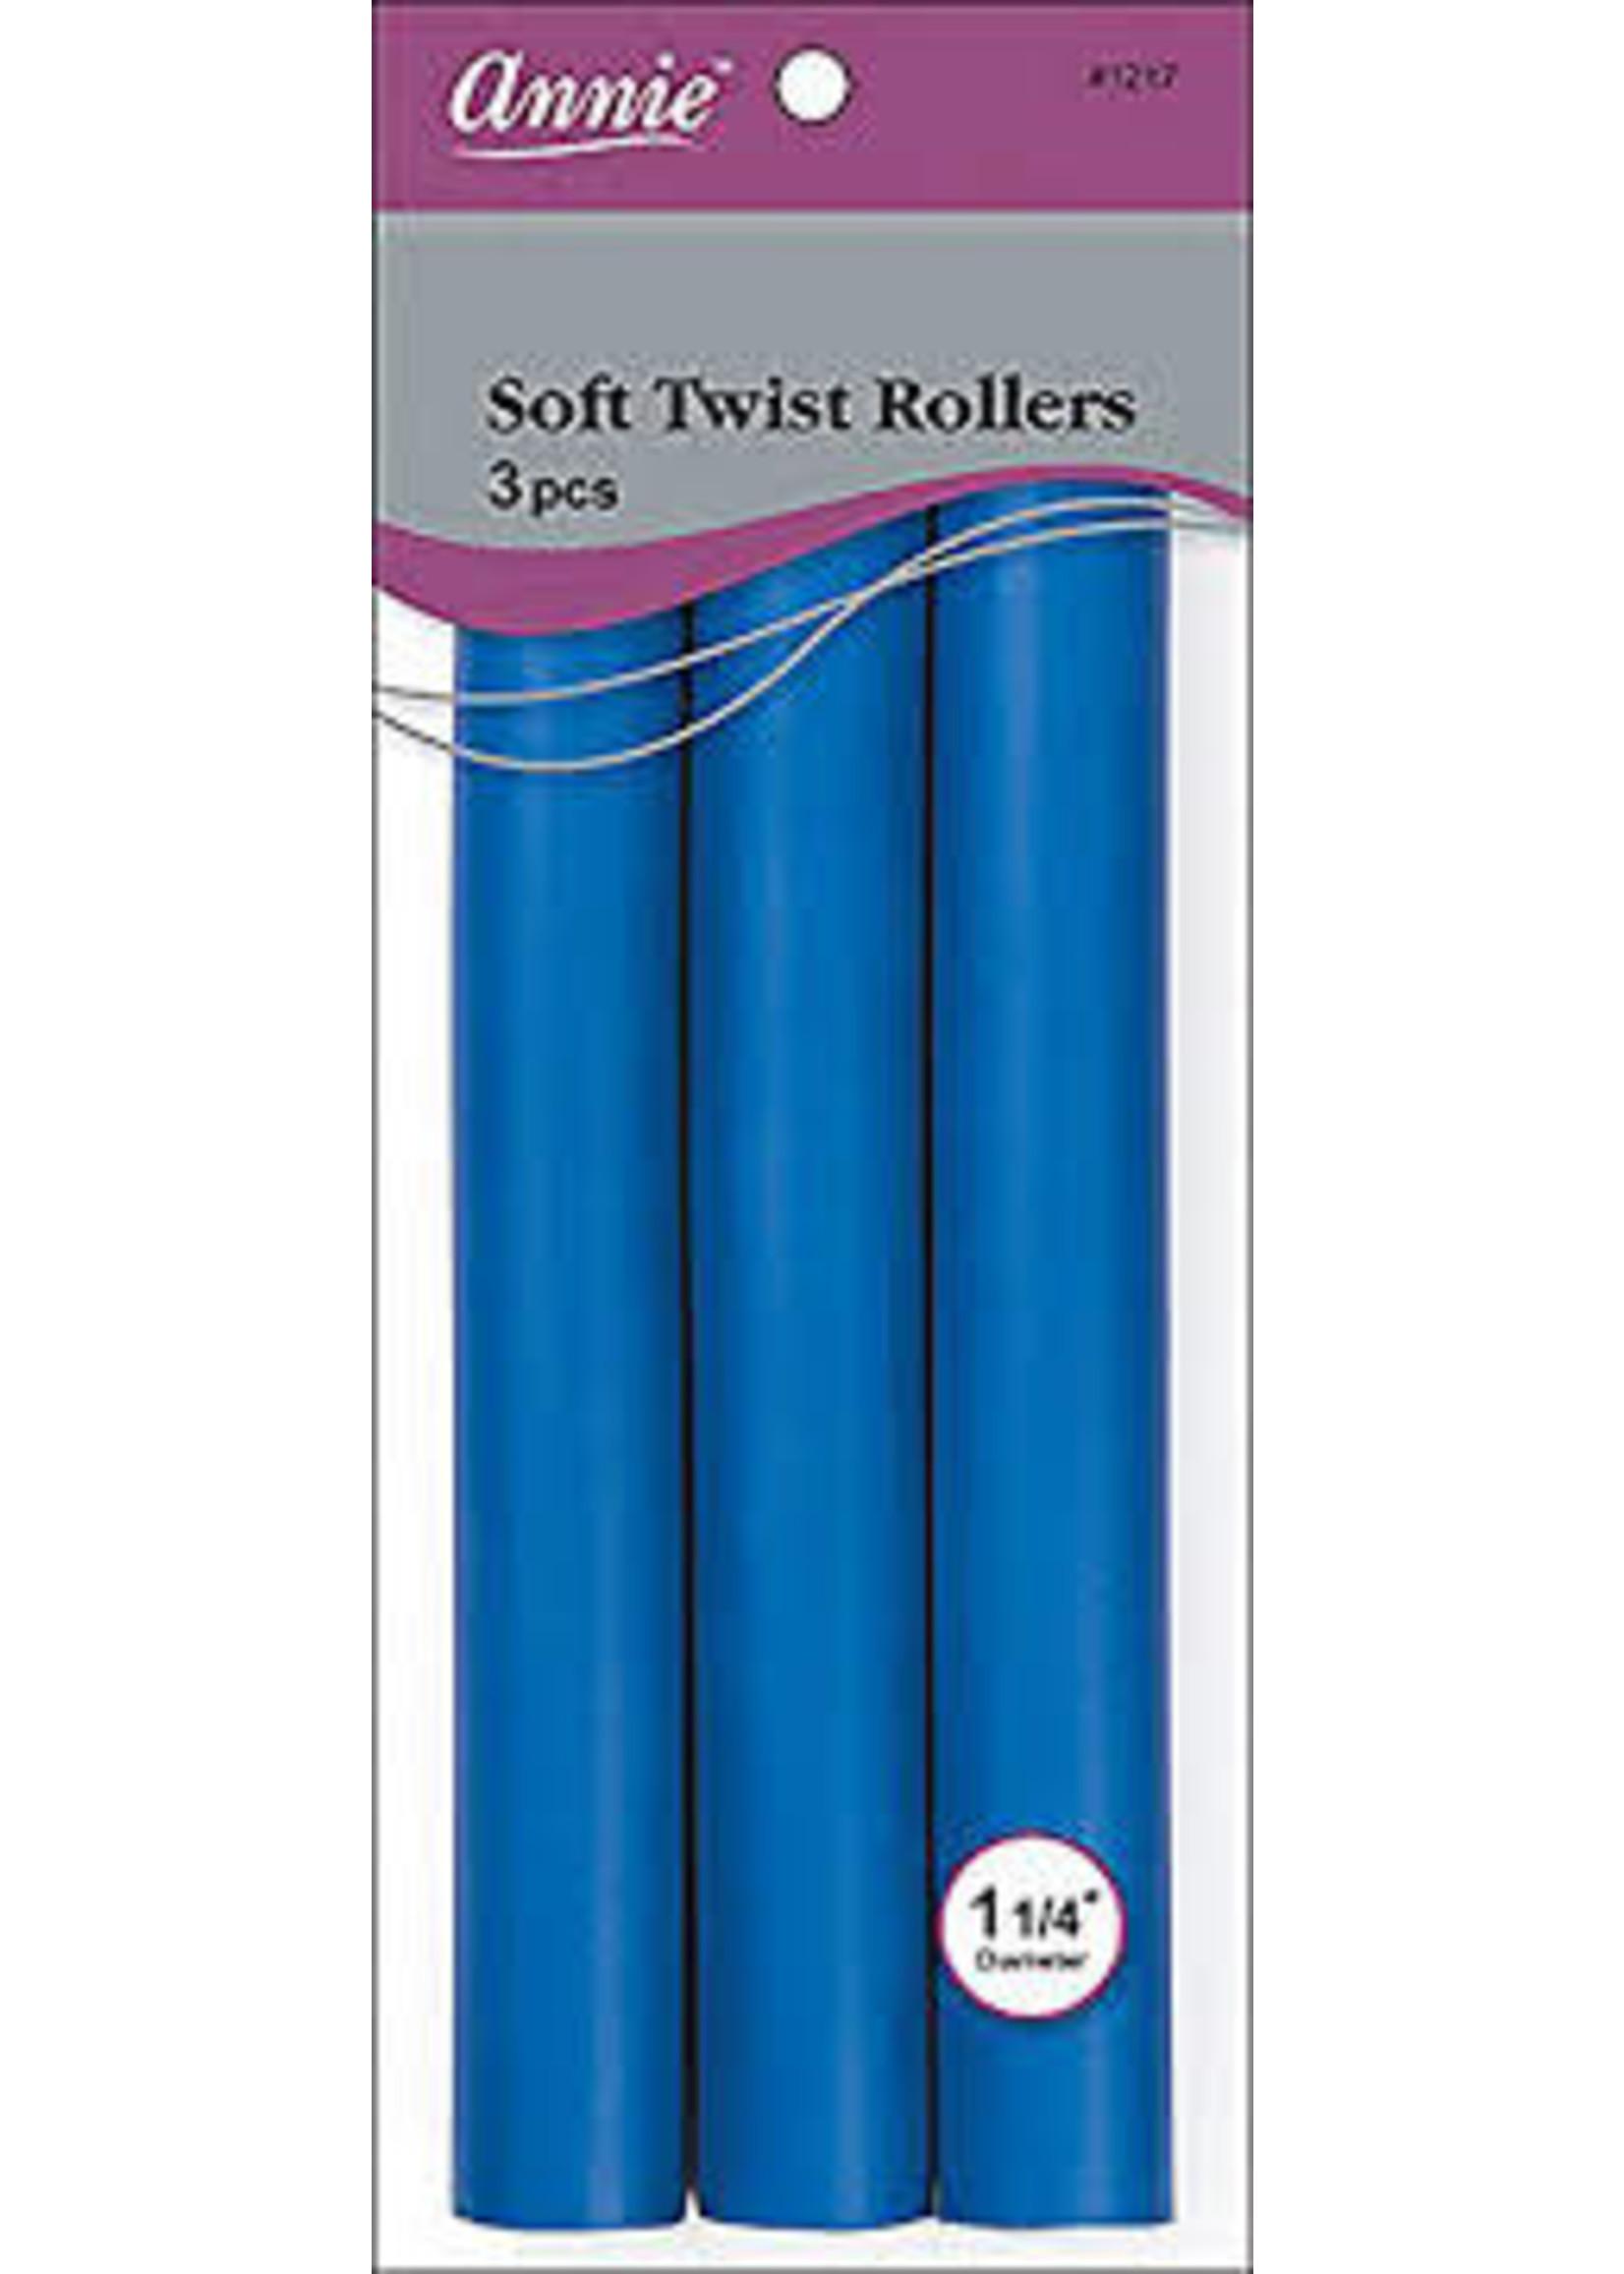 "ANNIE ROLLERS SOFT TWIST 10"" BLUE 1-1/4"""